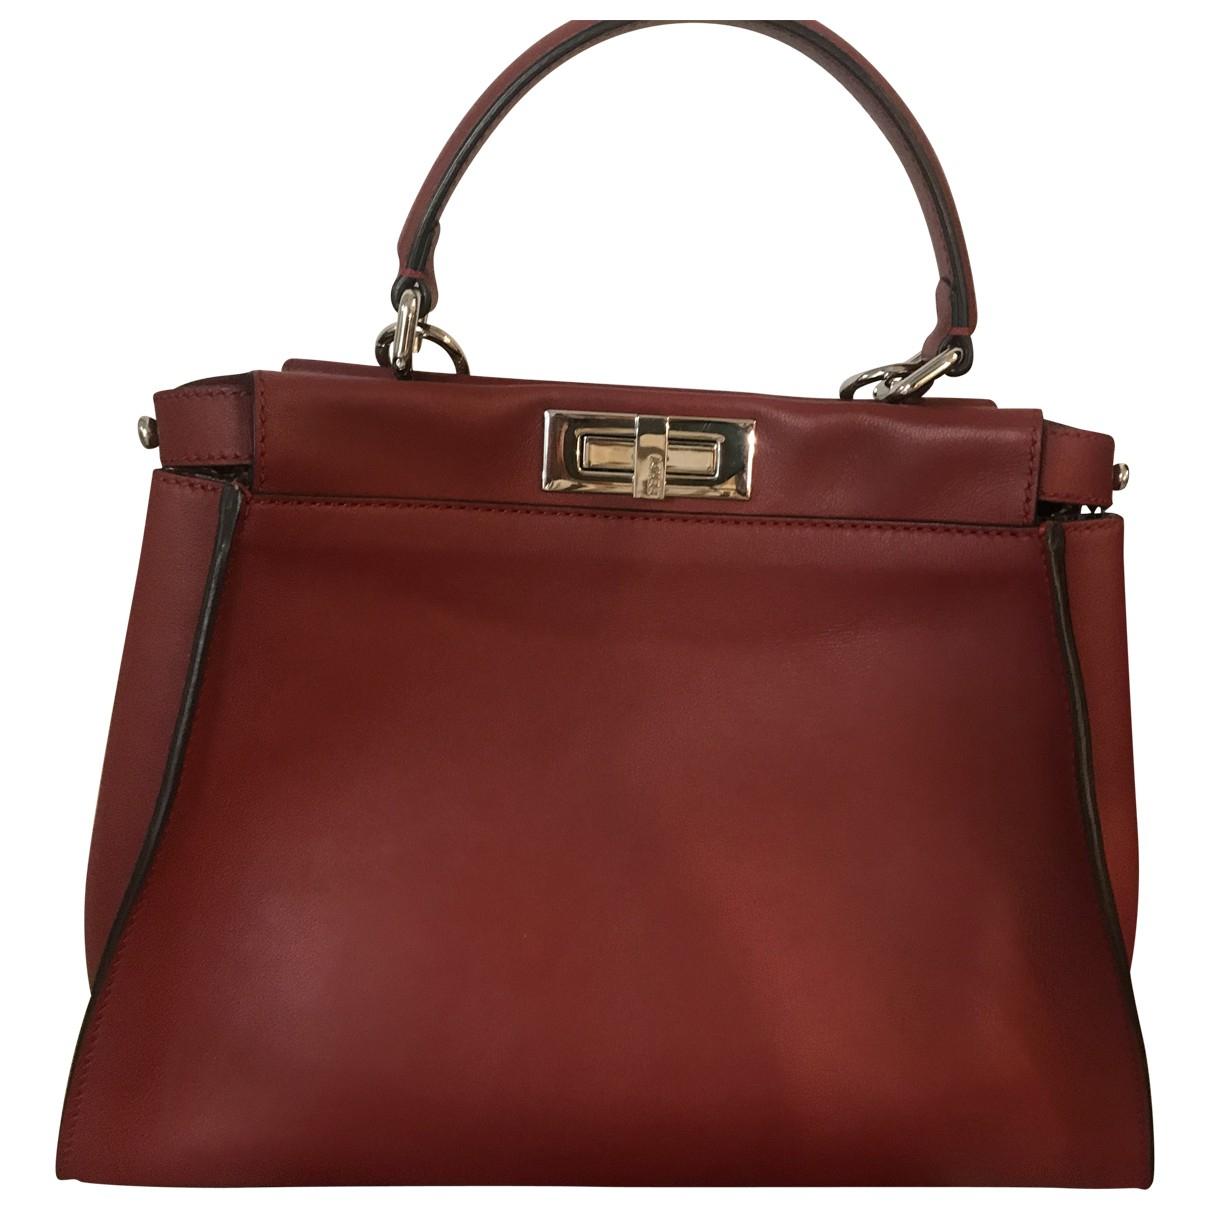 Fendi Peekaboo Handtasche in  Rot Leder